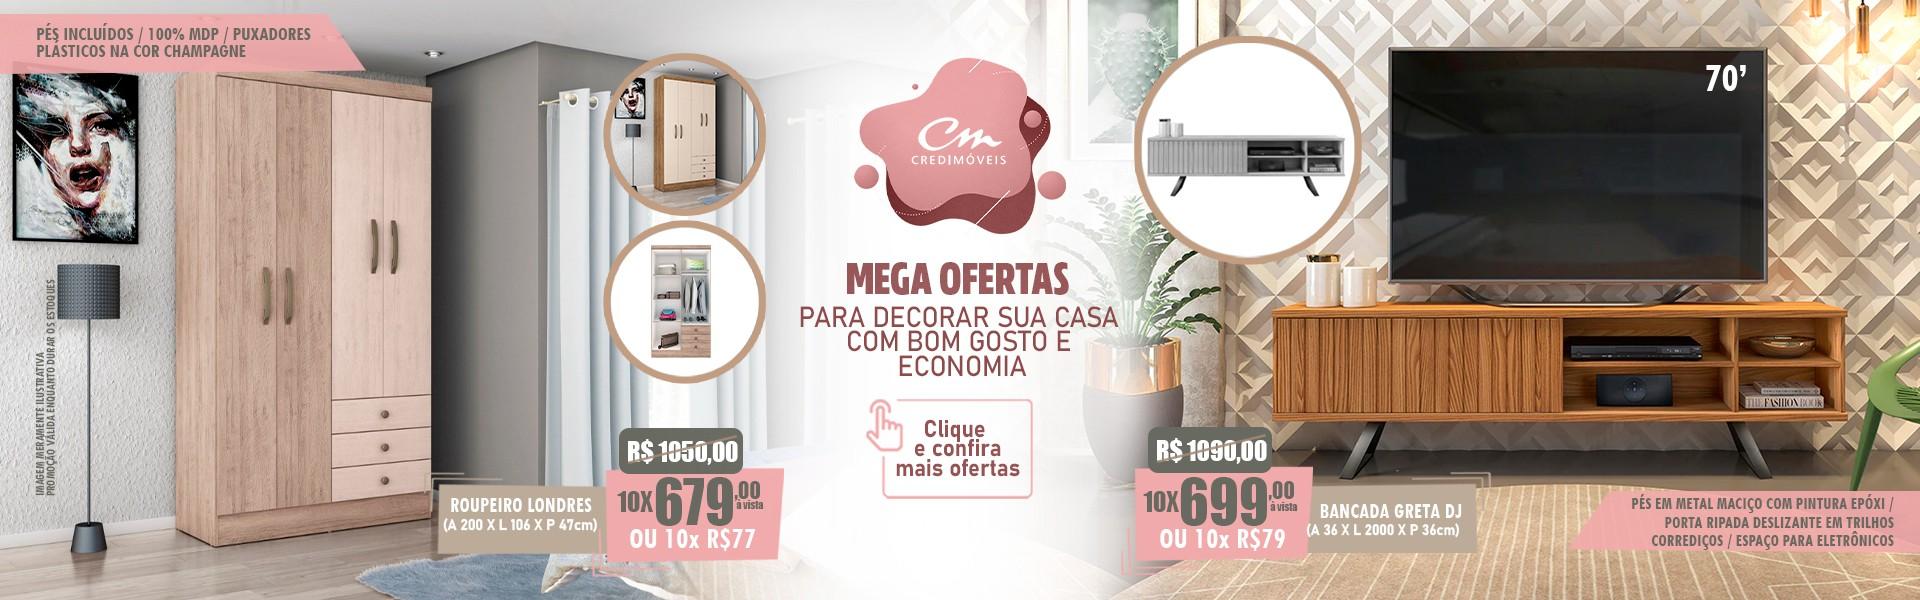 MEGA OFERTAS